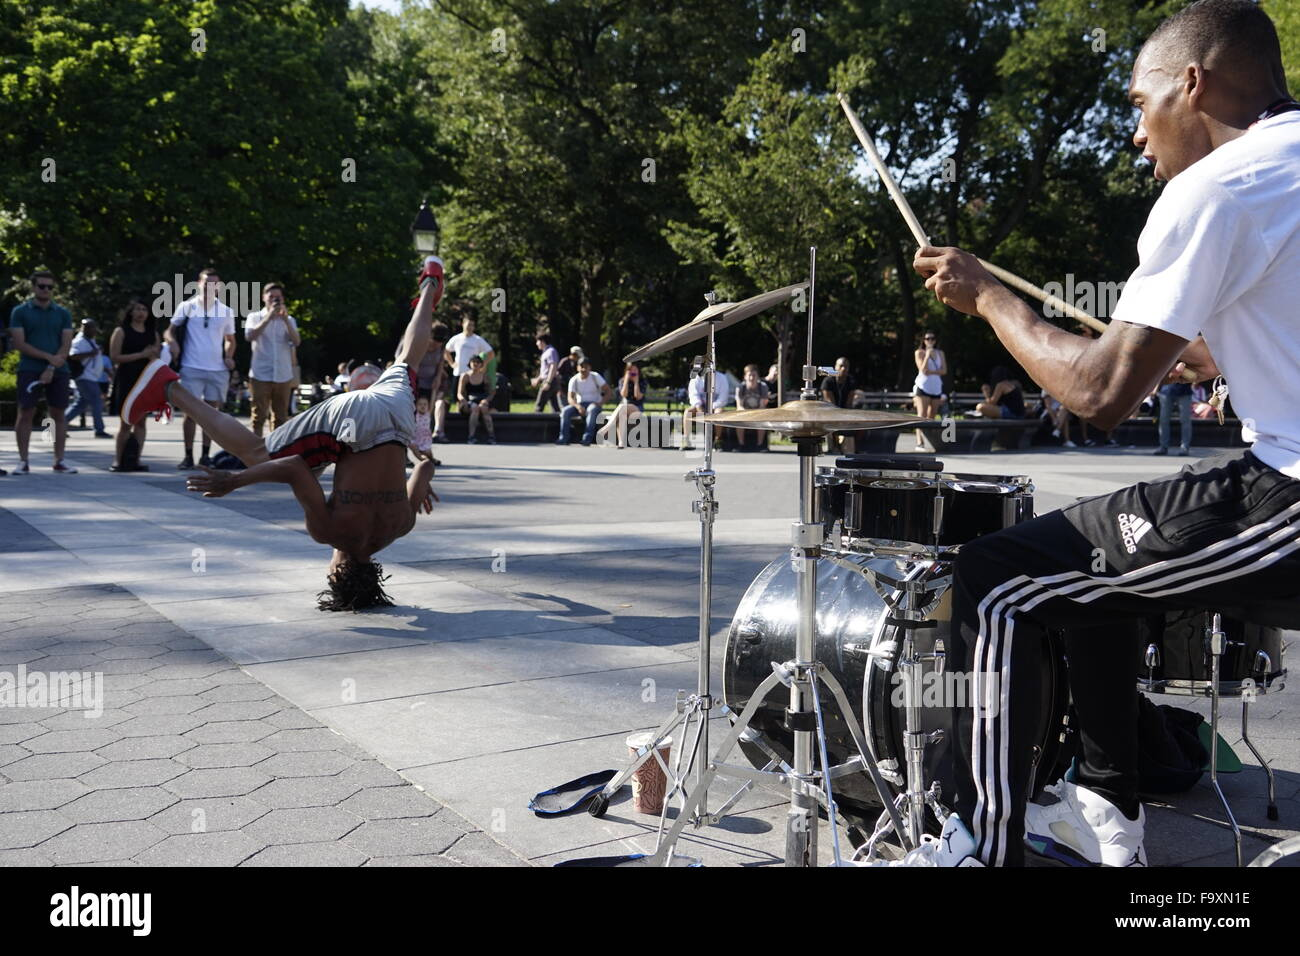 Street performer break dancing at Washington Square Park, Greenwich Village, New York City, USA Stock Photo